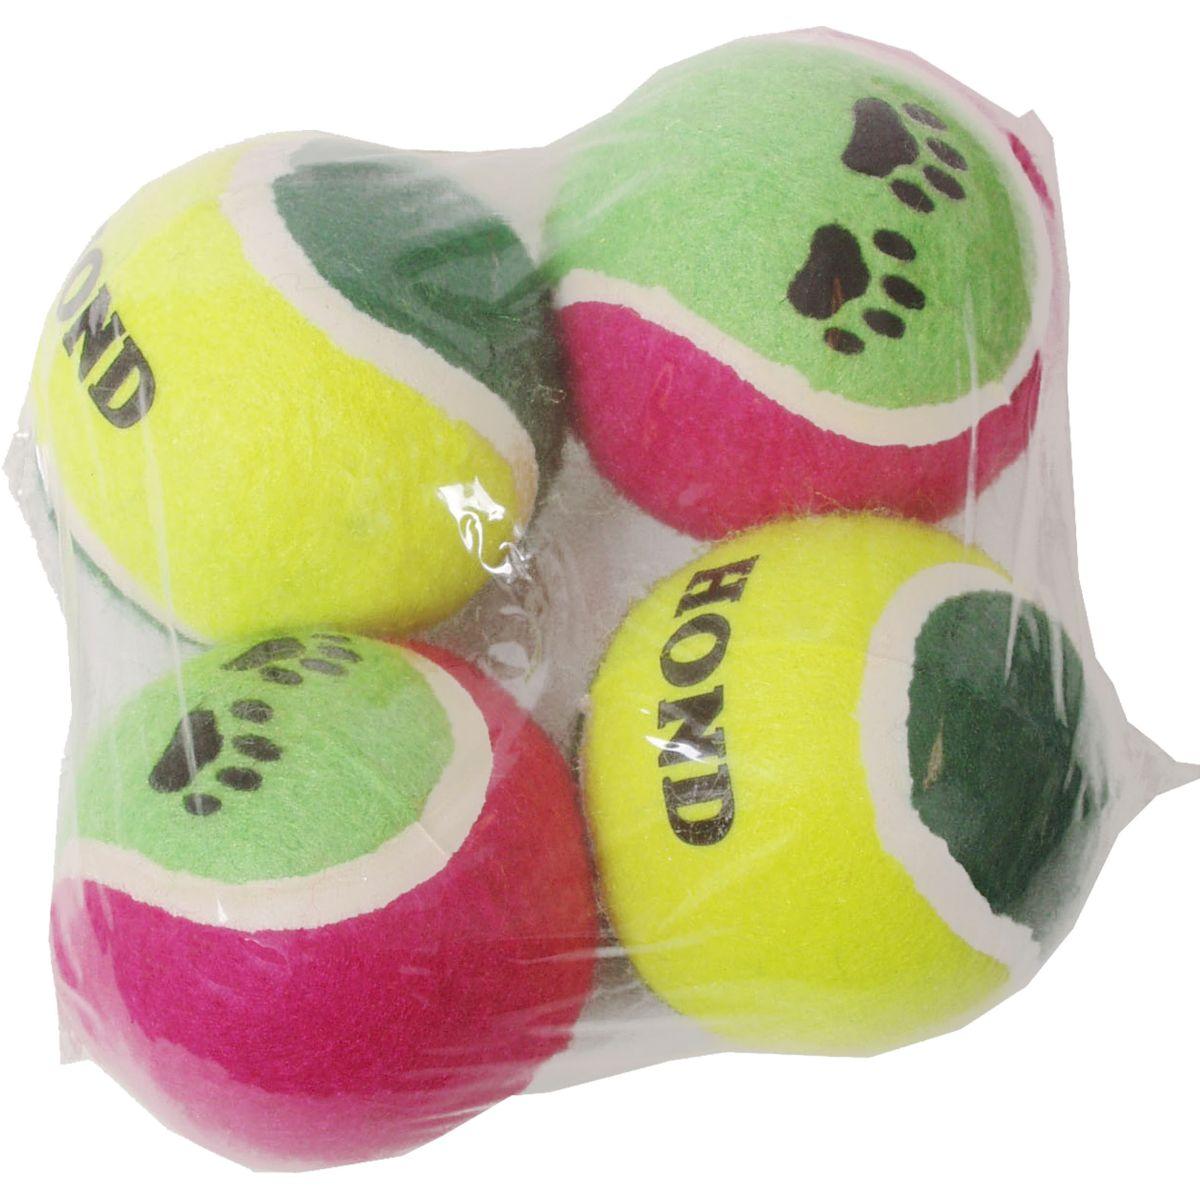 Boon 6,5 cm tennisbal 6,5cm